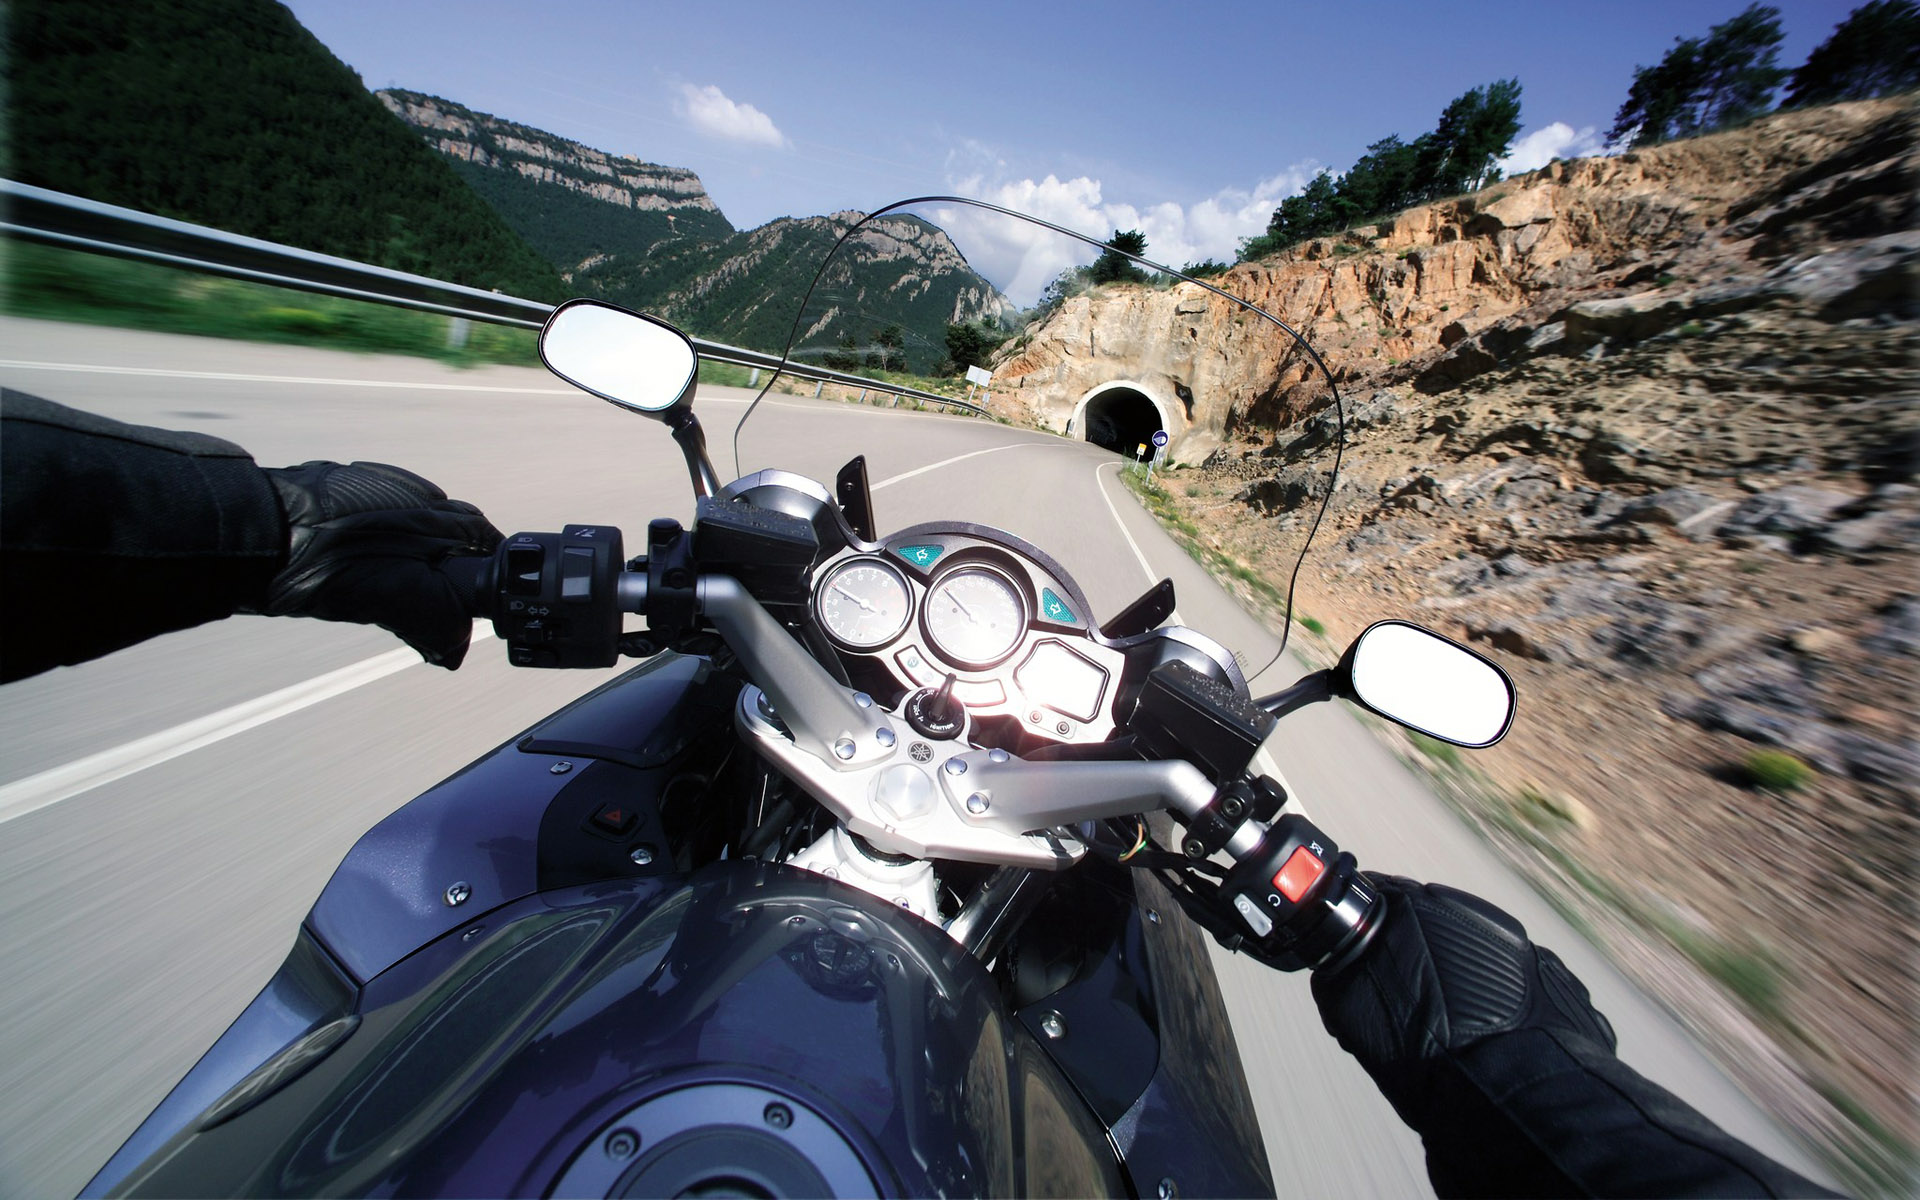 мотоцикл yamaha дорога загрузить